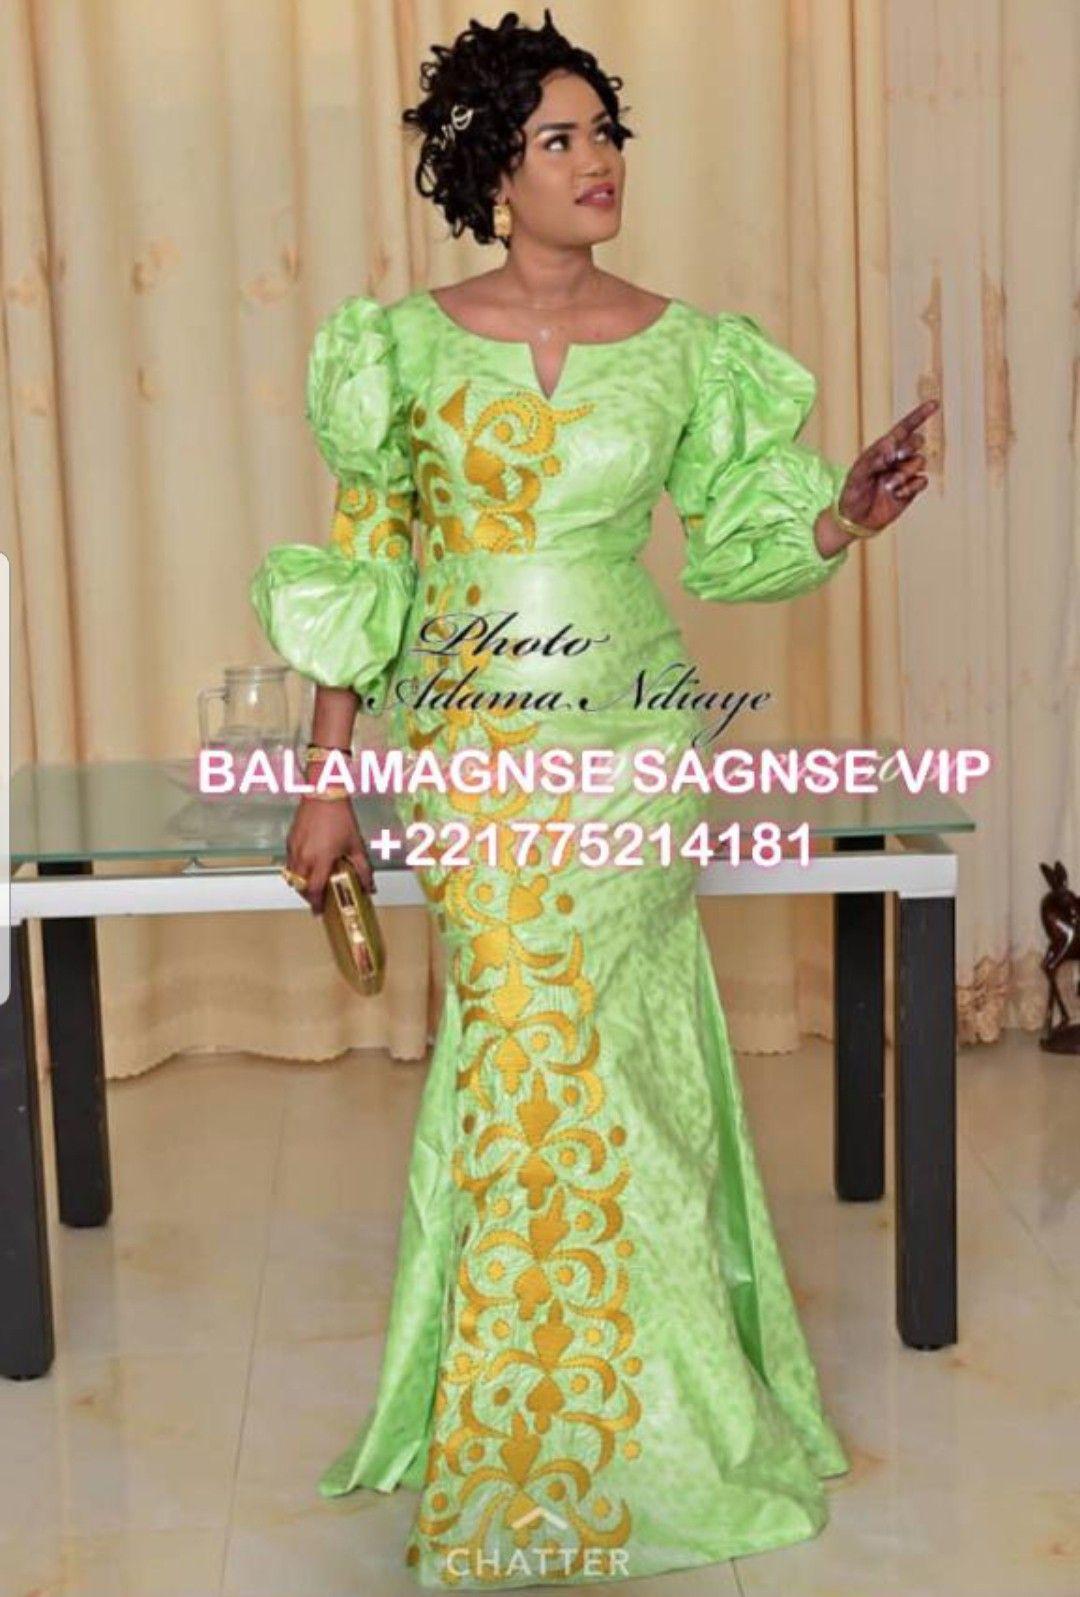 Épinglé par Dieynaba Dieye Samaté sur Mode africaine en